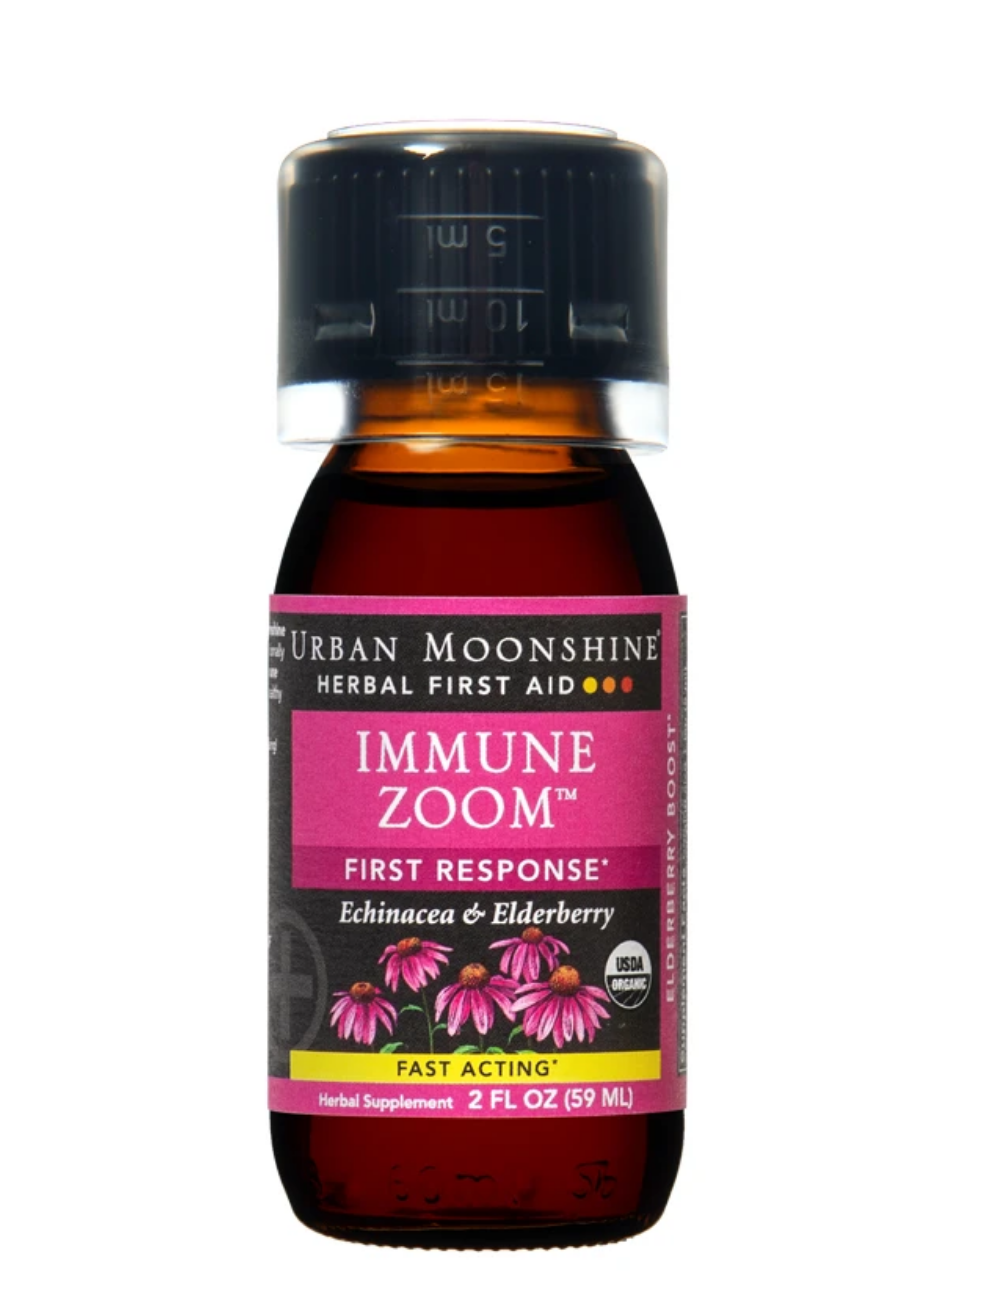 Immune Zoom,Urban Moonshine,59 ml